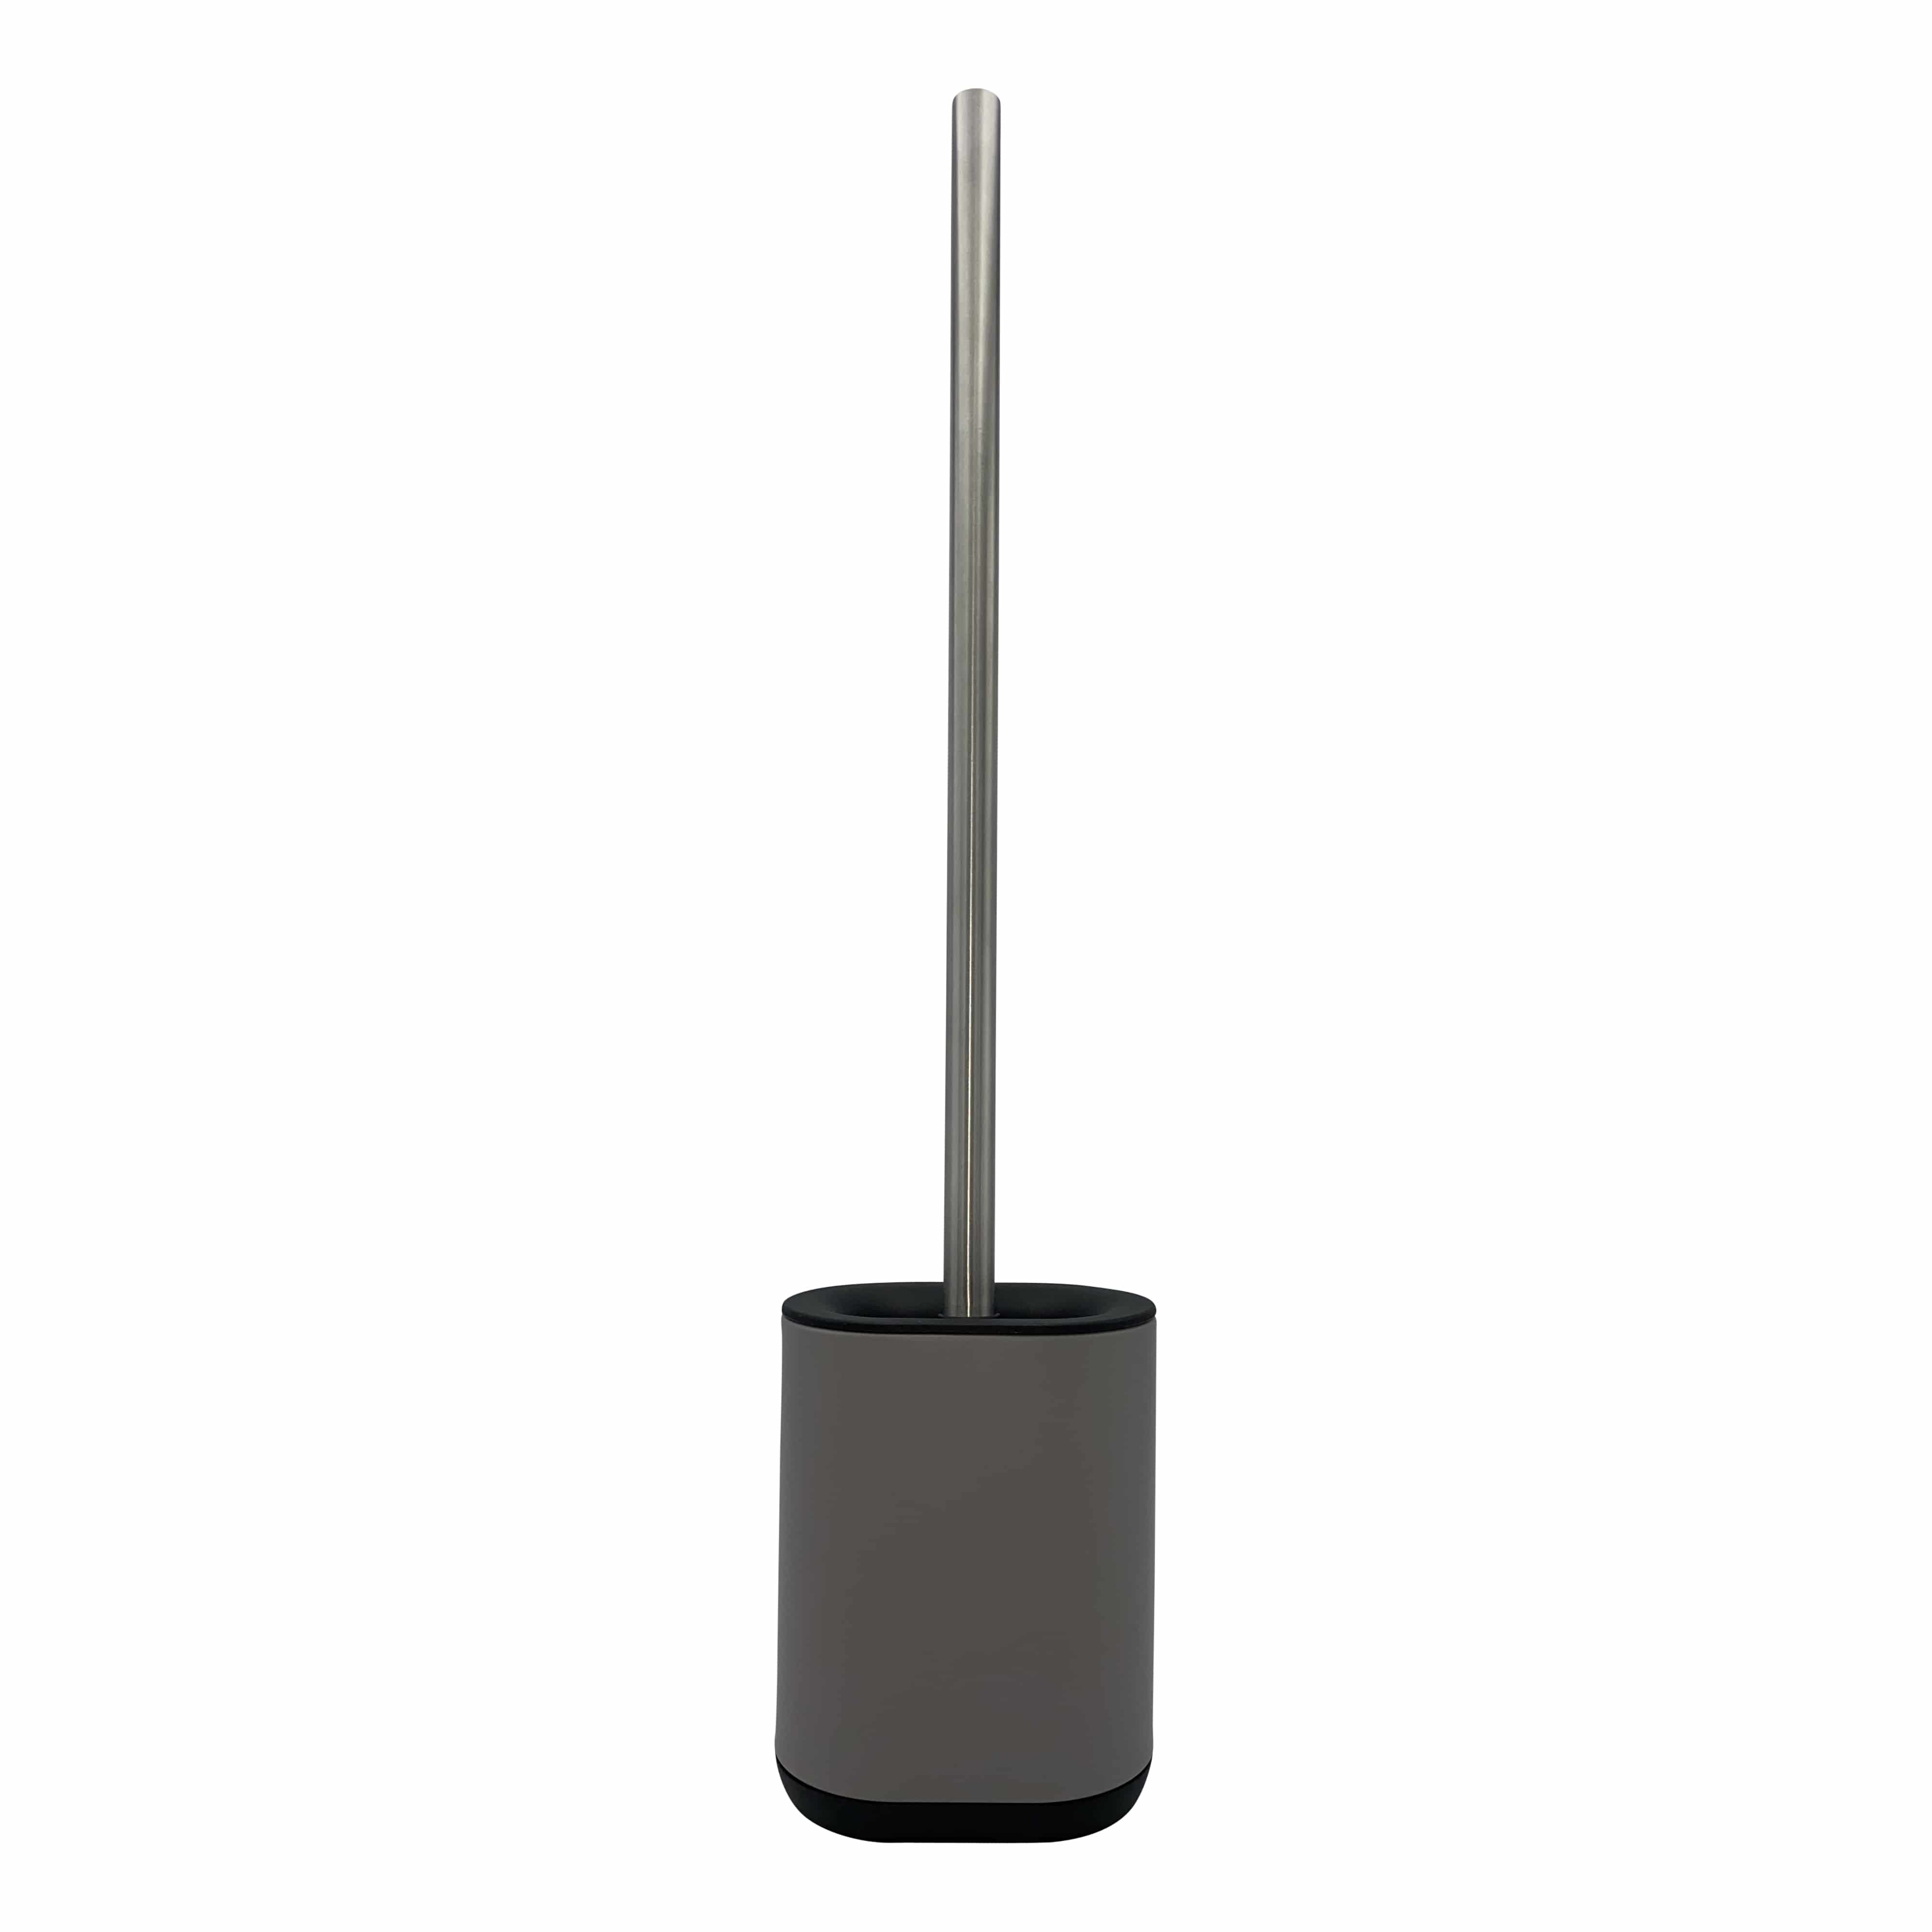 4goodz toiletborstel met extra lange steel - 11.4x7.7x52cm - Taupe